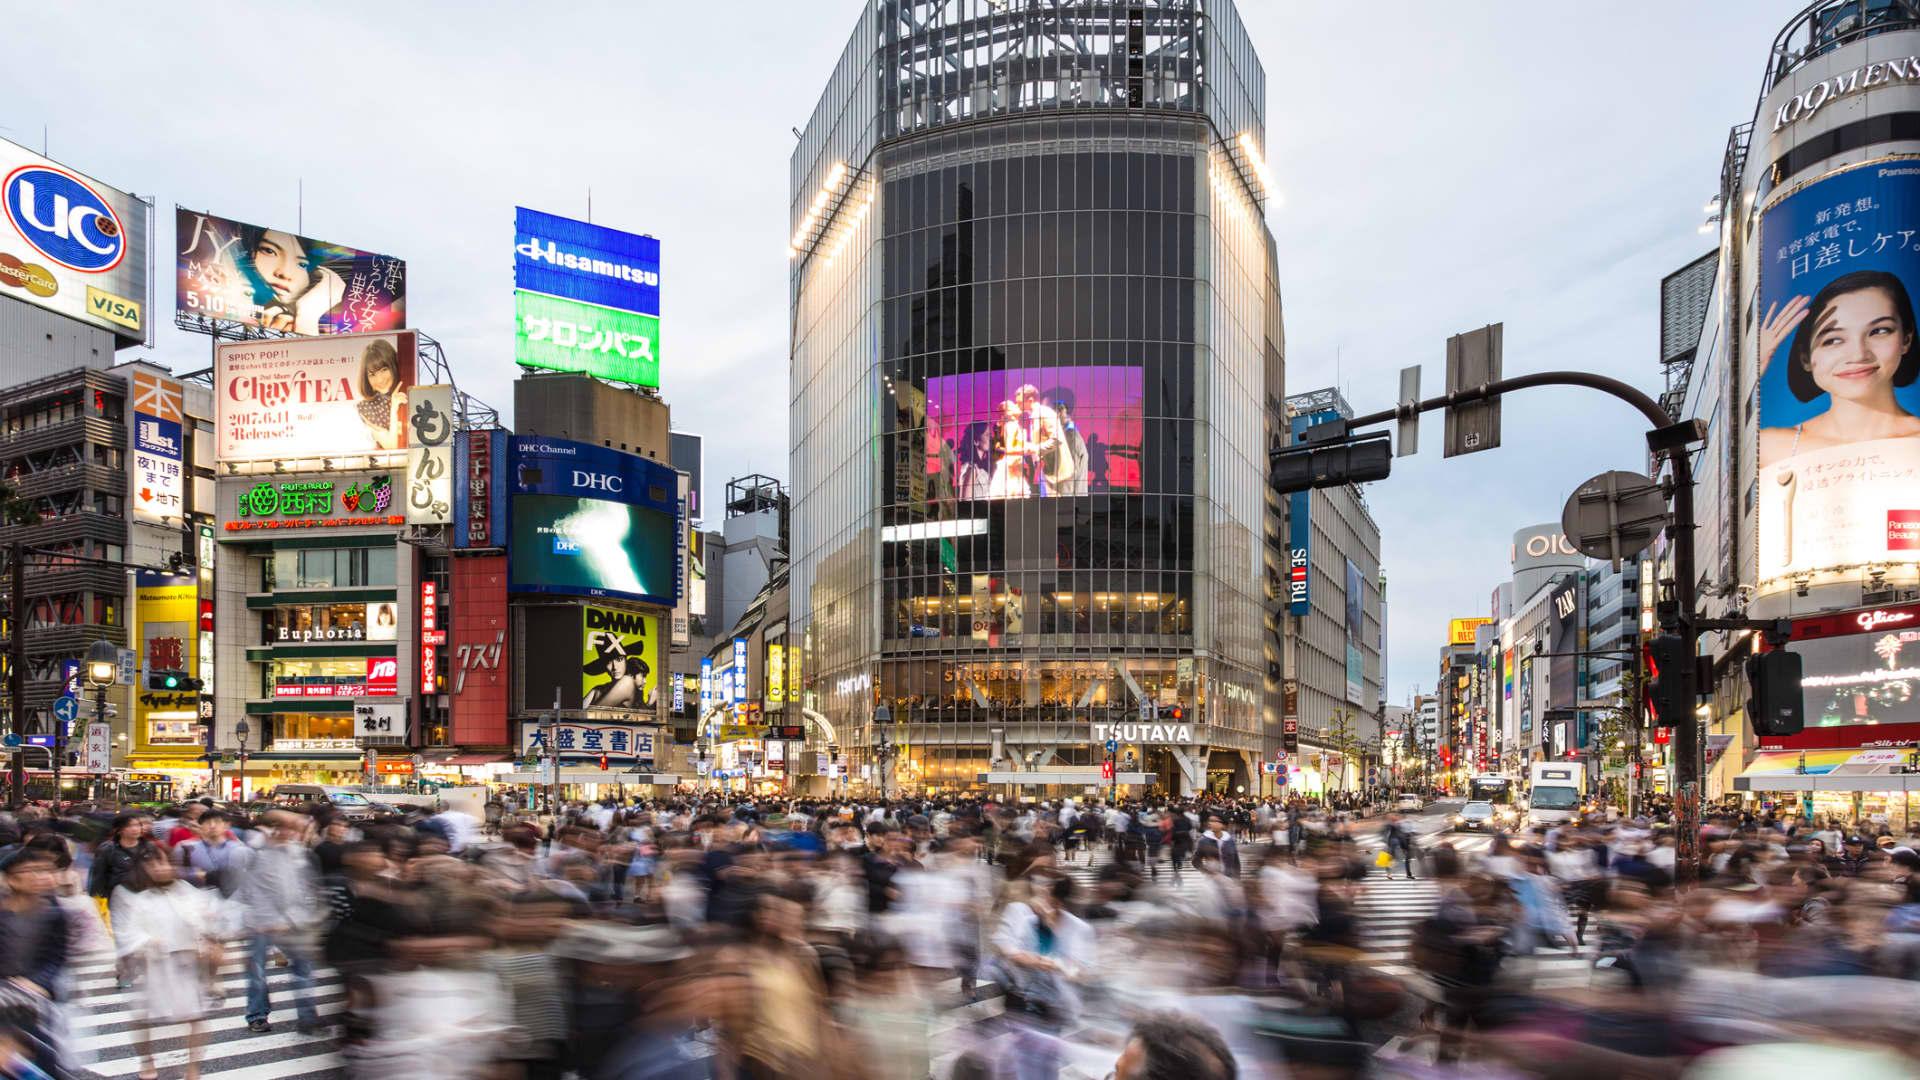 Crowds walk through Shibuya Crossing in Tokyo, Japan.